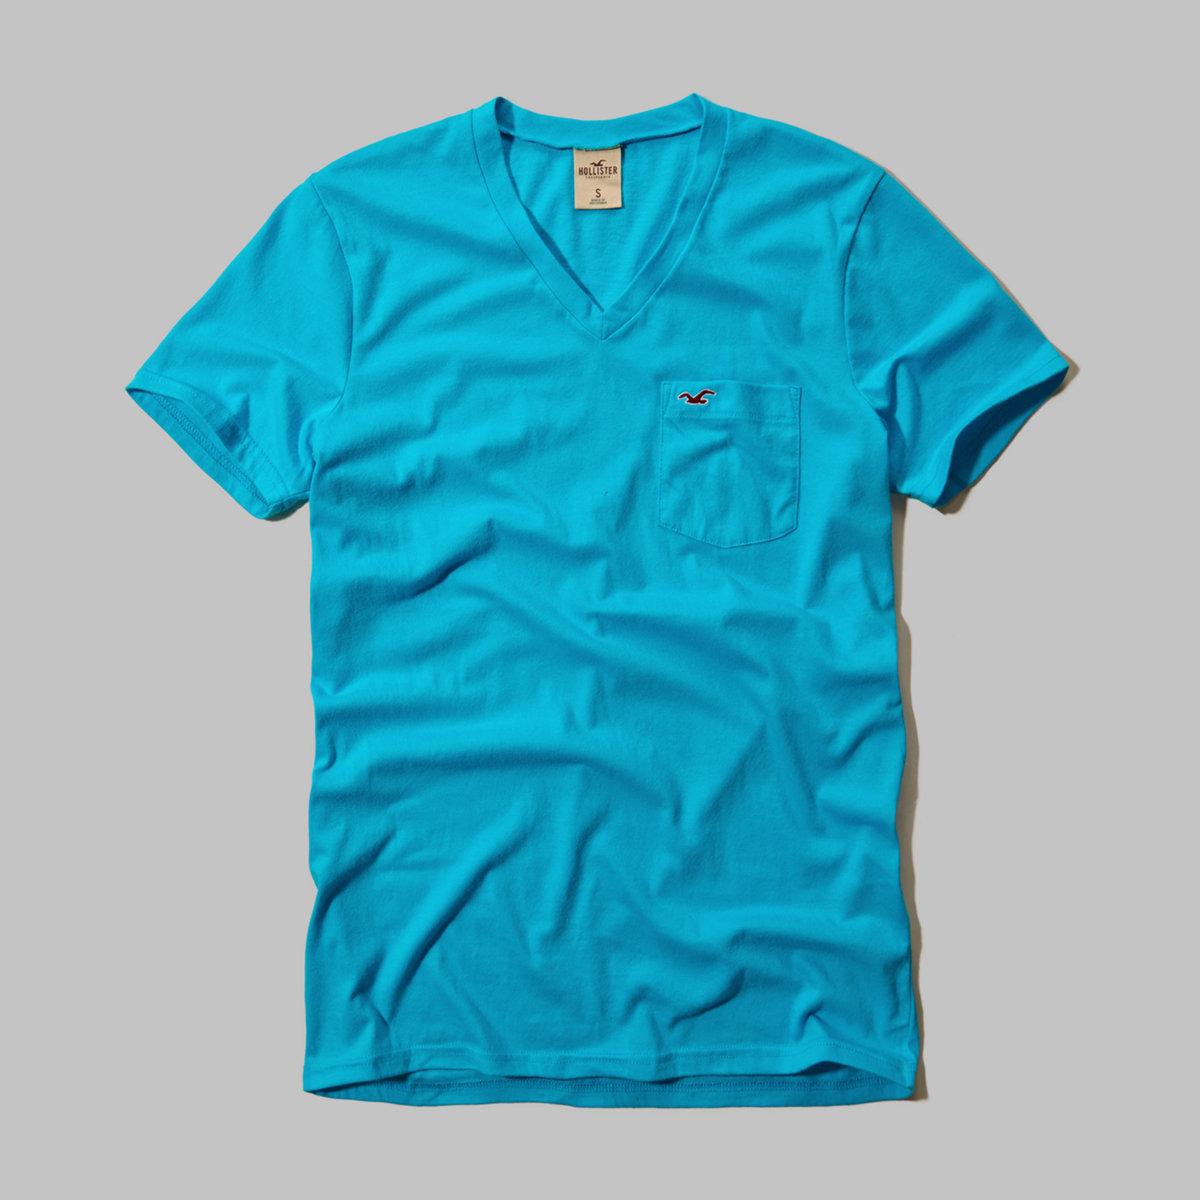 Wipeout Beach V Neck T-Shirt